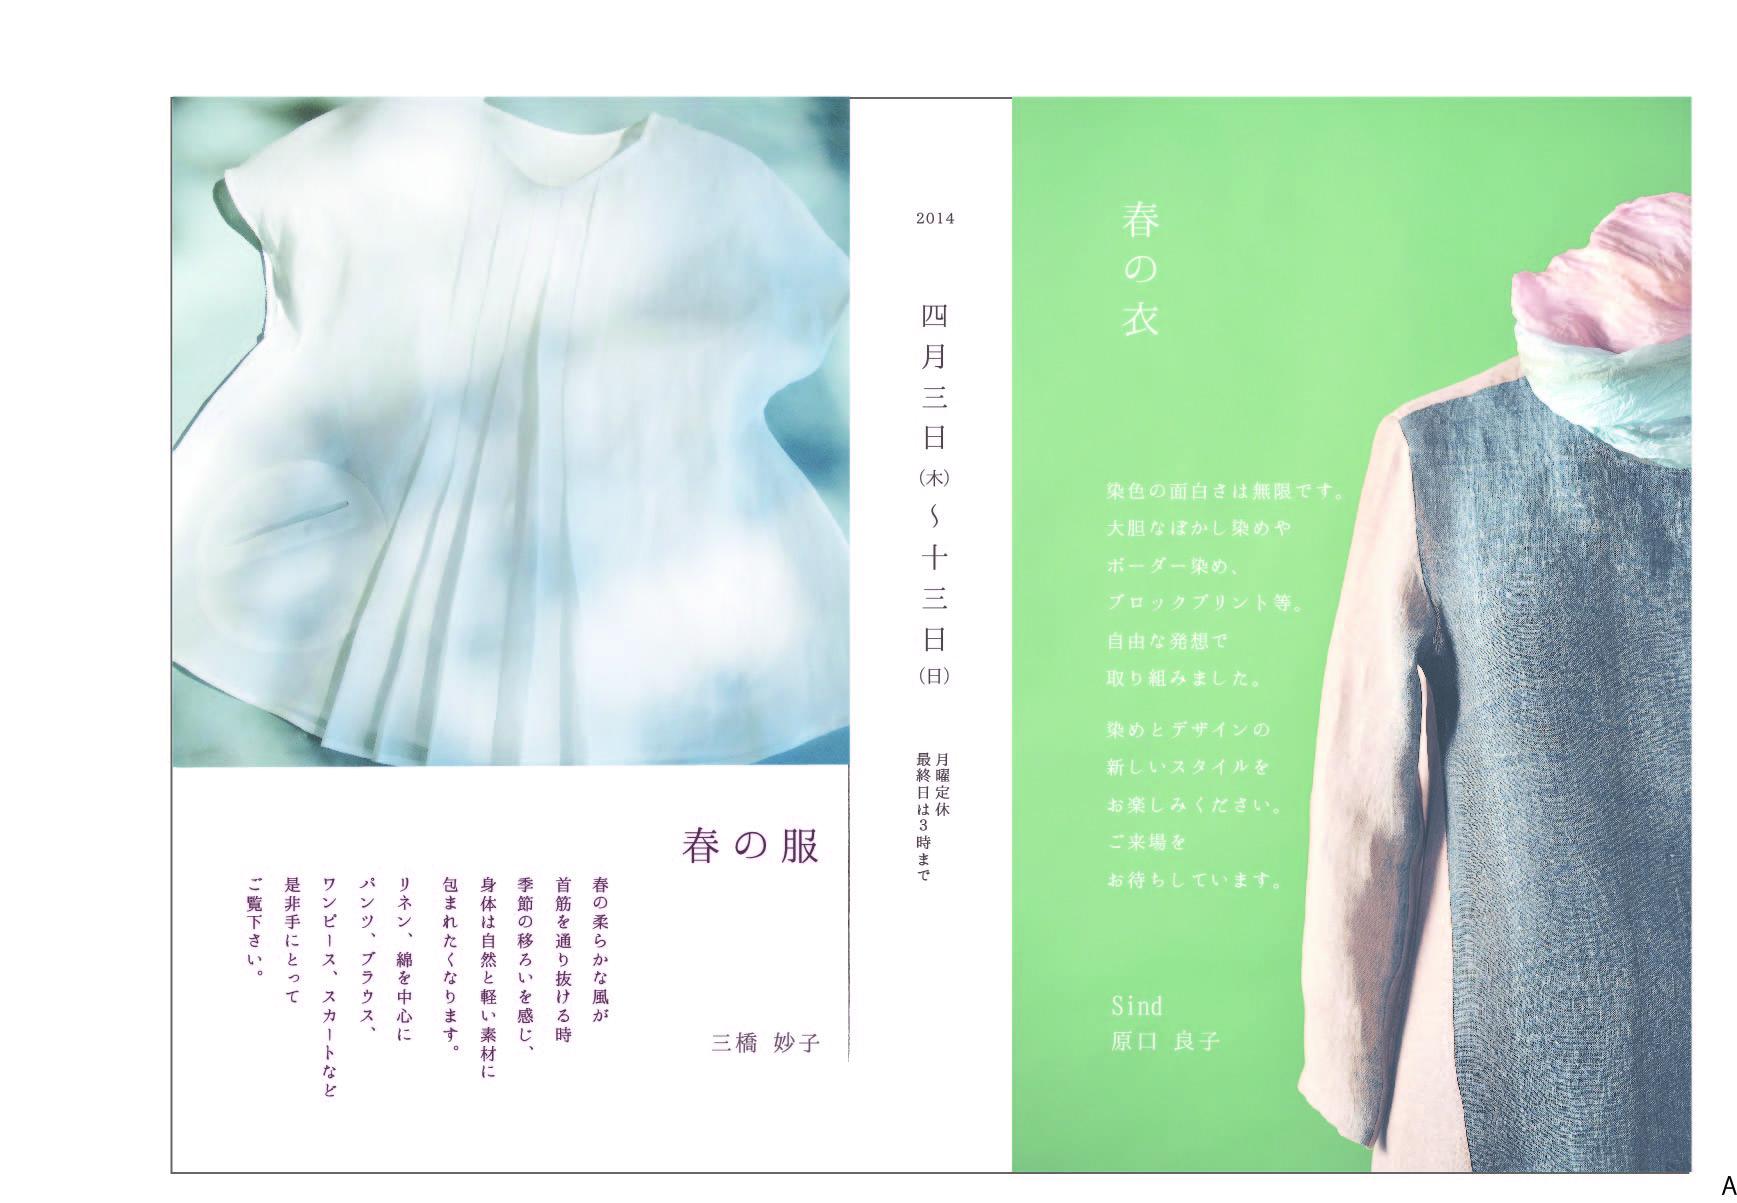 三橋妙子 春の服展_c0256701_22105971.jpg